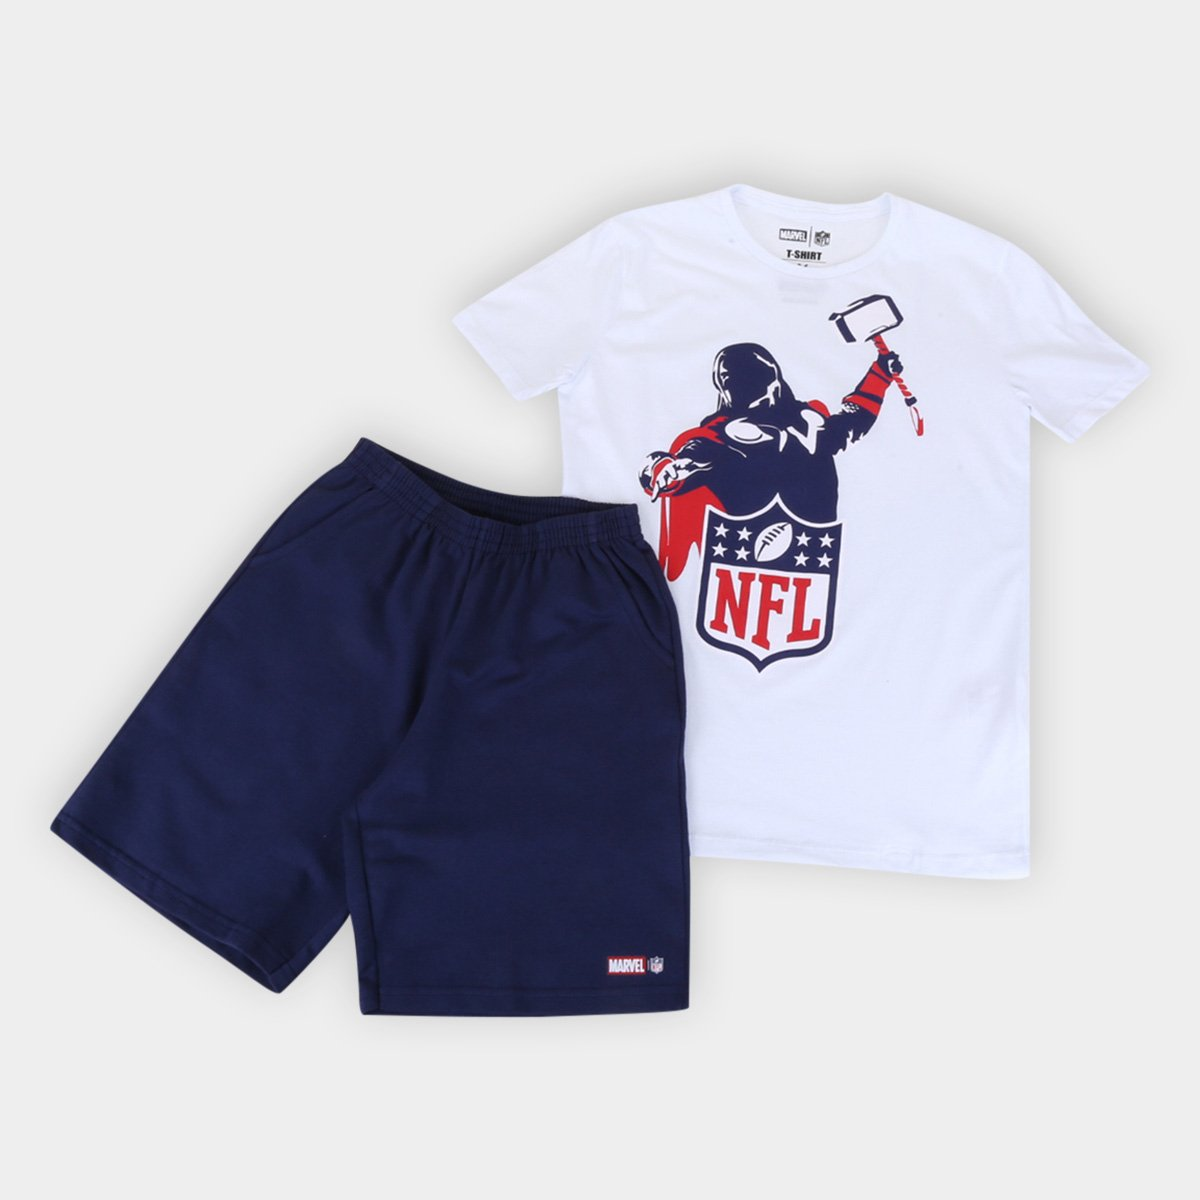 Conjunto Juvenil NFL Marvel Masculino